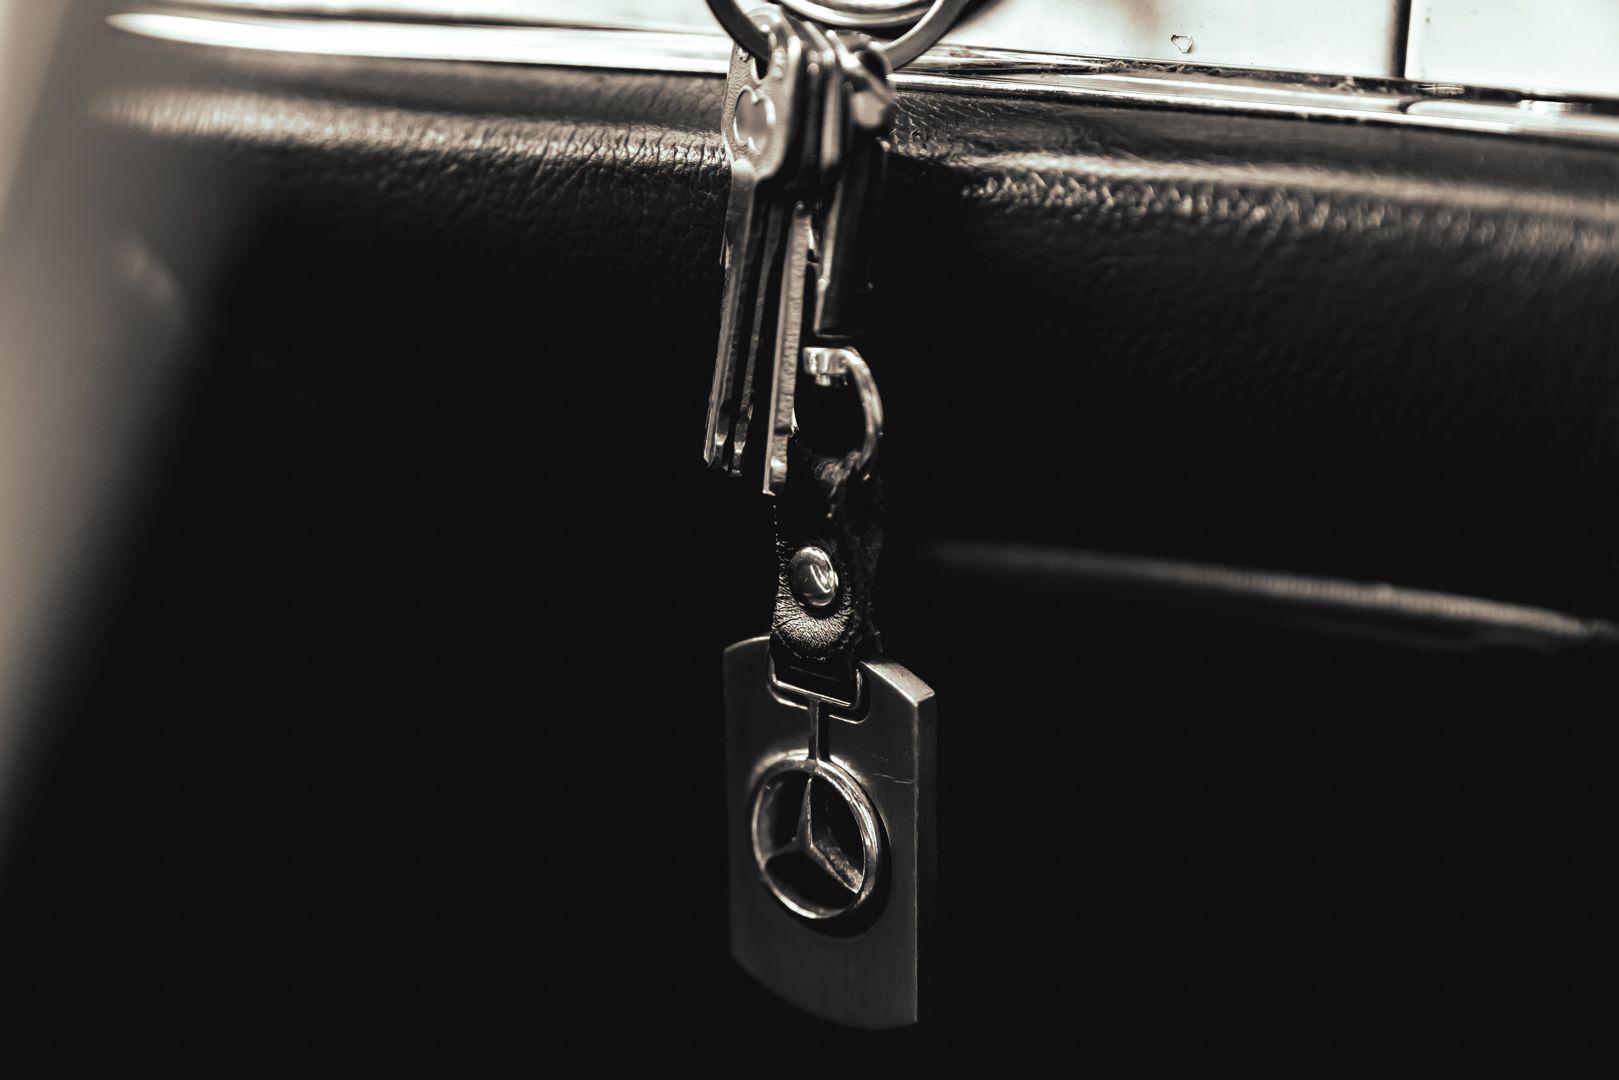 1965 Mercedes-Benz SL230 Pagoda 78541